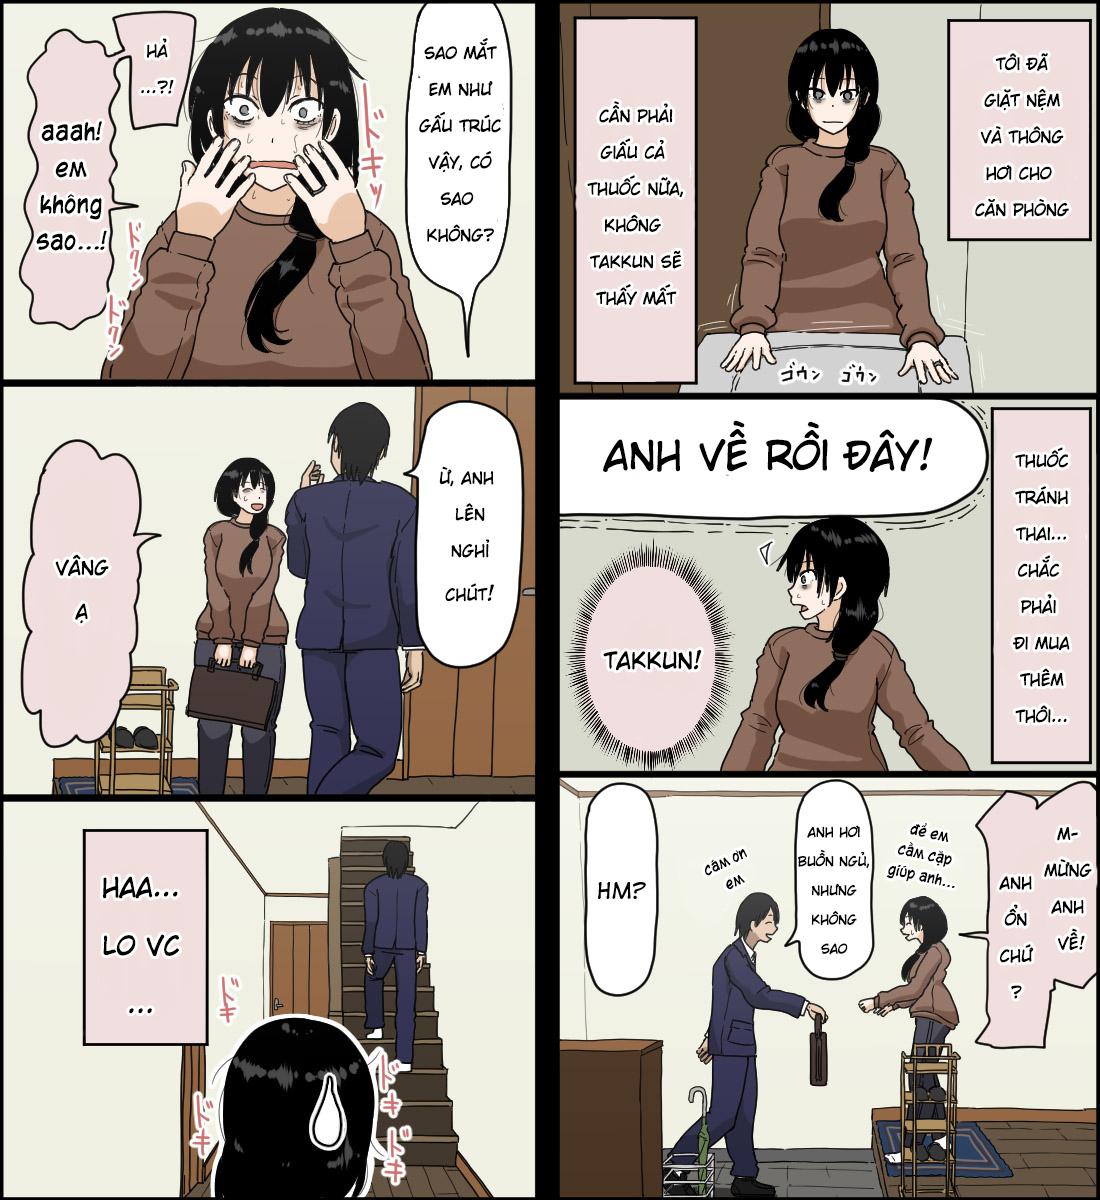 HentaiVN.net - Ảnh 70 - Sasaki Natsumi no Shikyuu ga Ochita Hi - 佐々木夏実の子宮が堕ちた日 - Full ( gộp 3 chap )